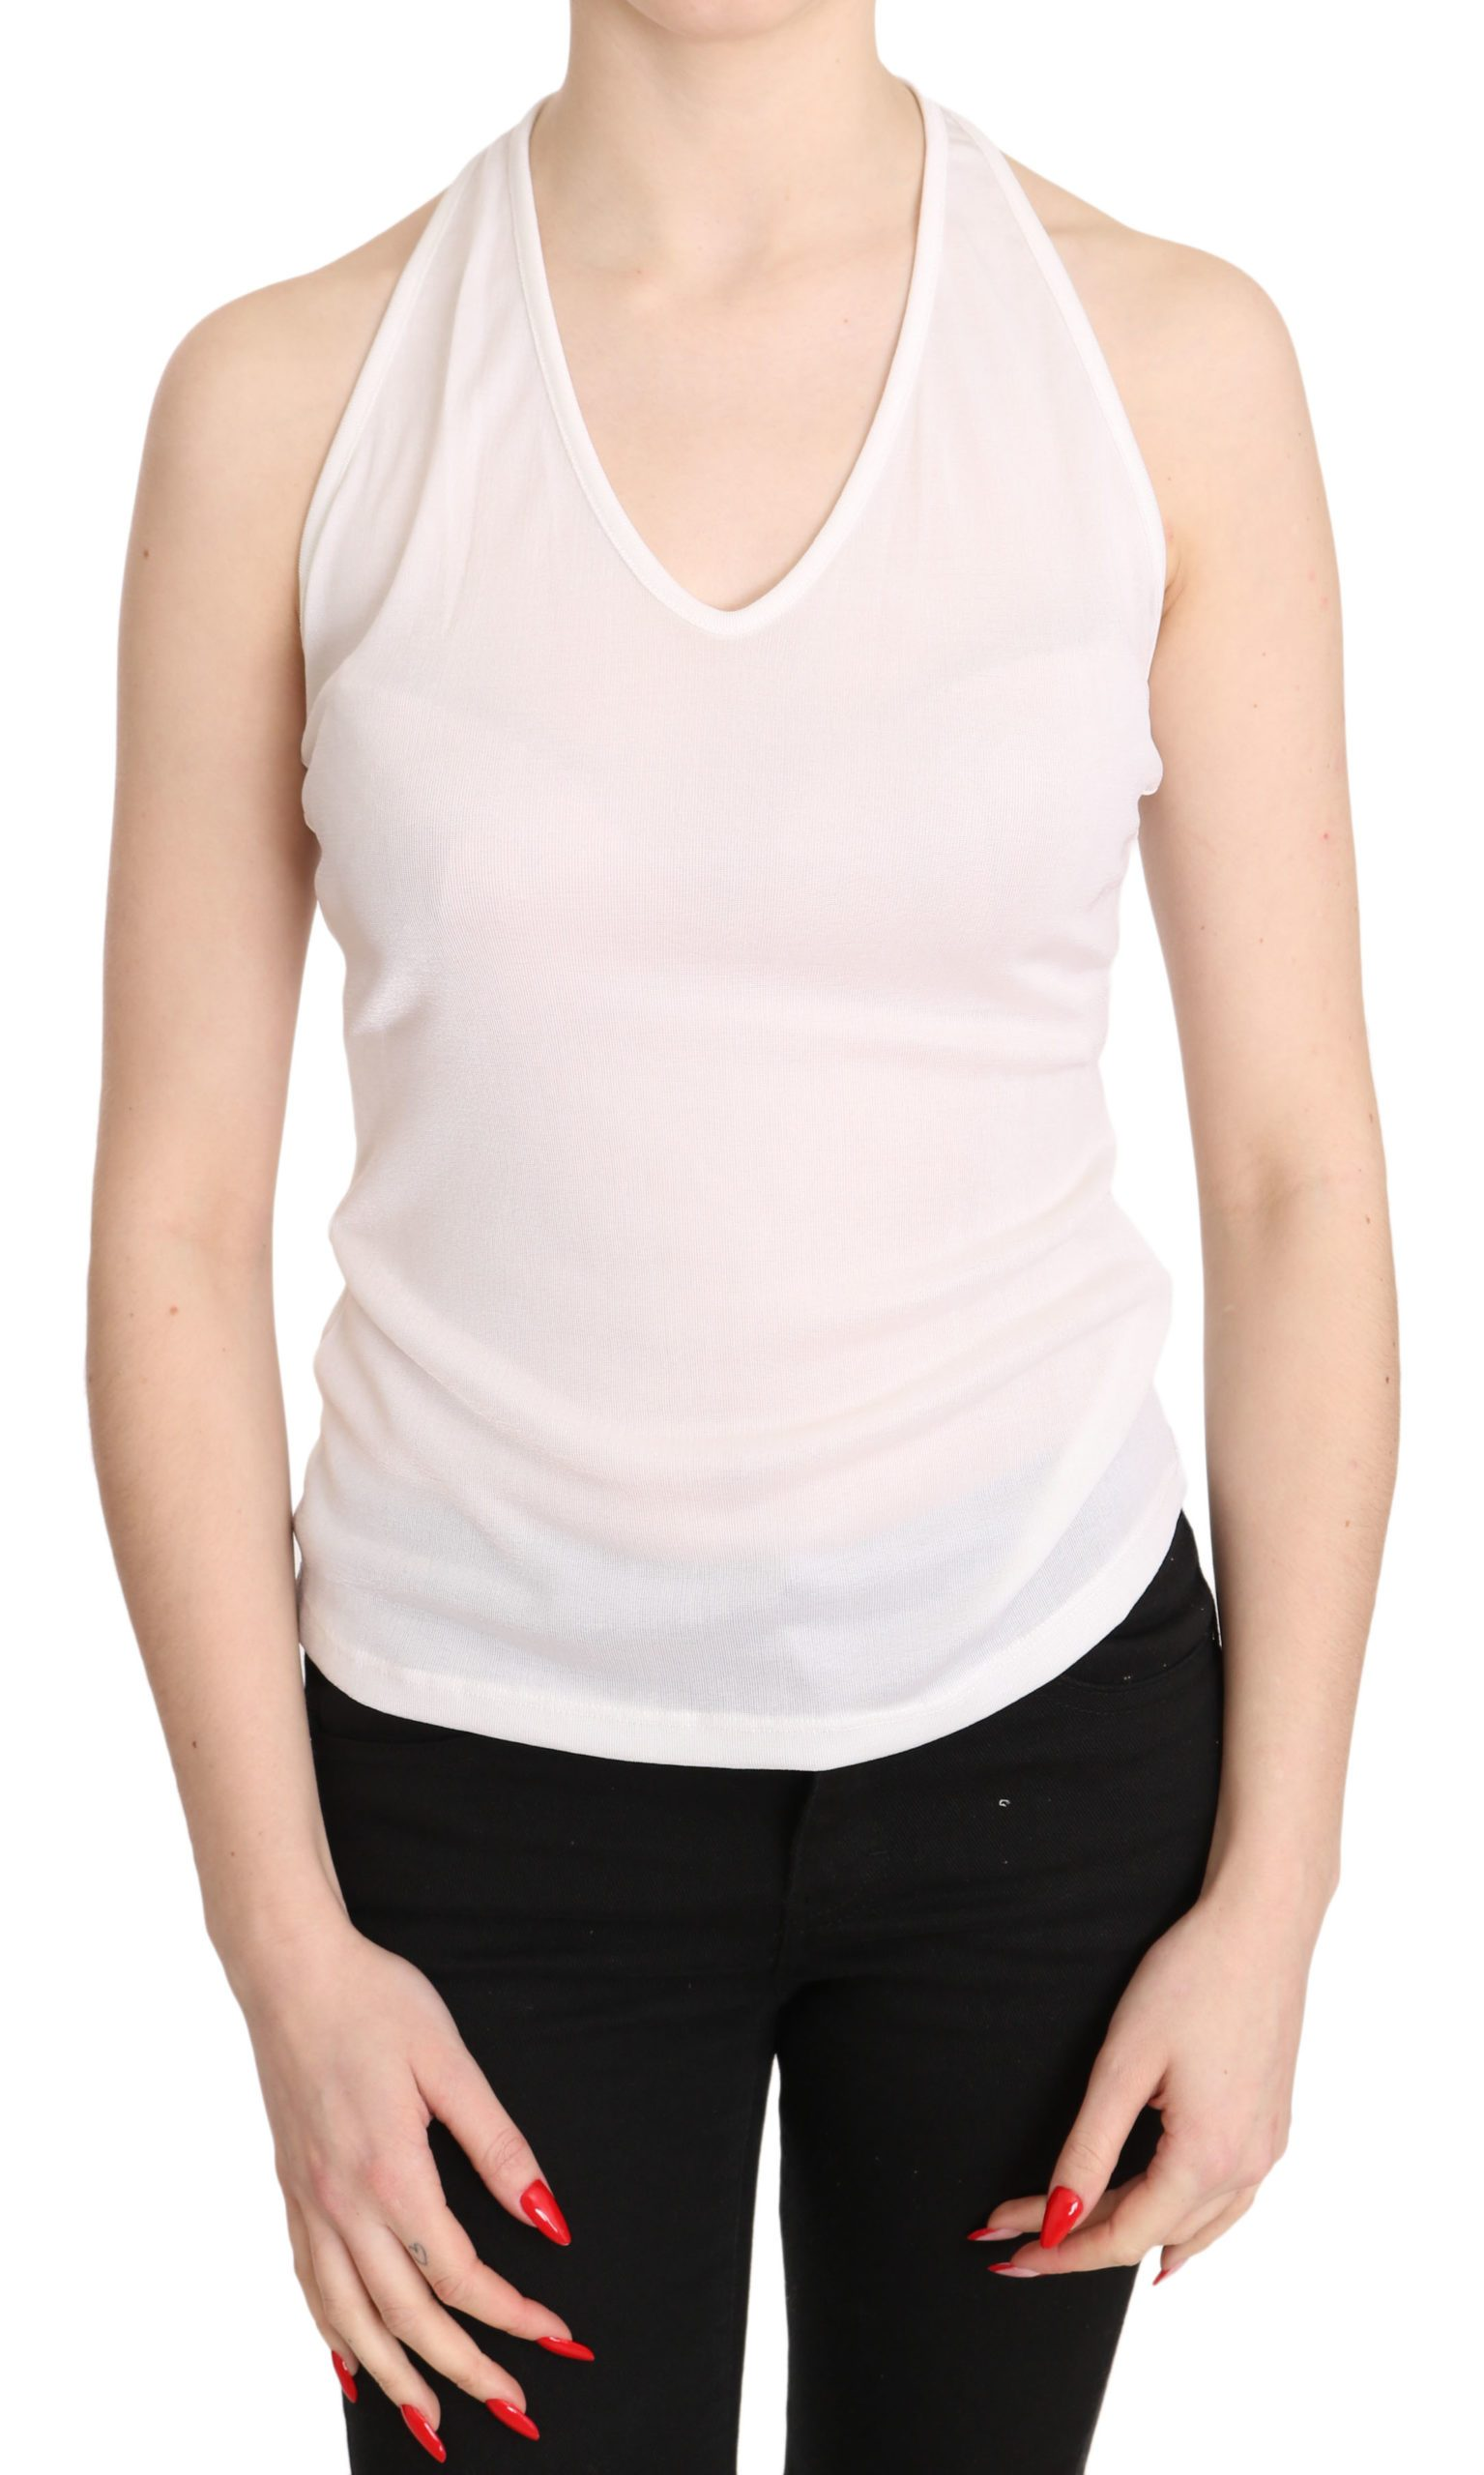 GF Ferre Women's Halter Cotton Sleeveless Casual Top White TSH3418 - IT38 XS